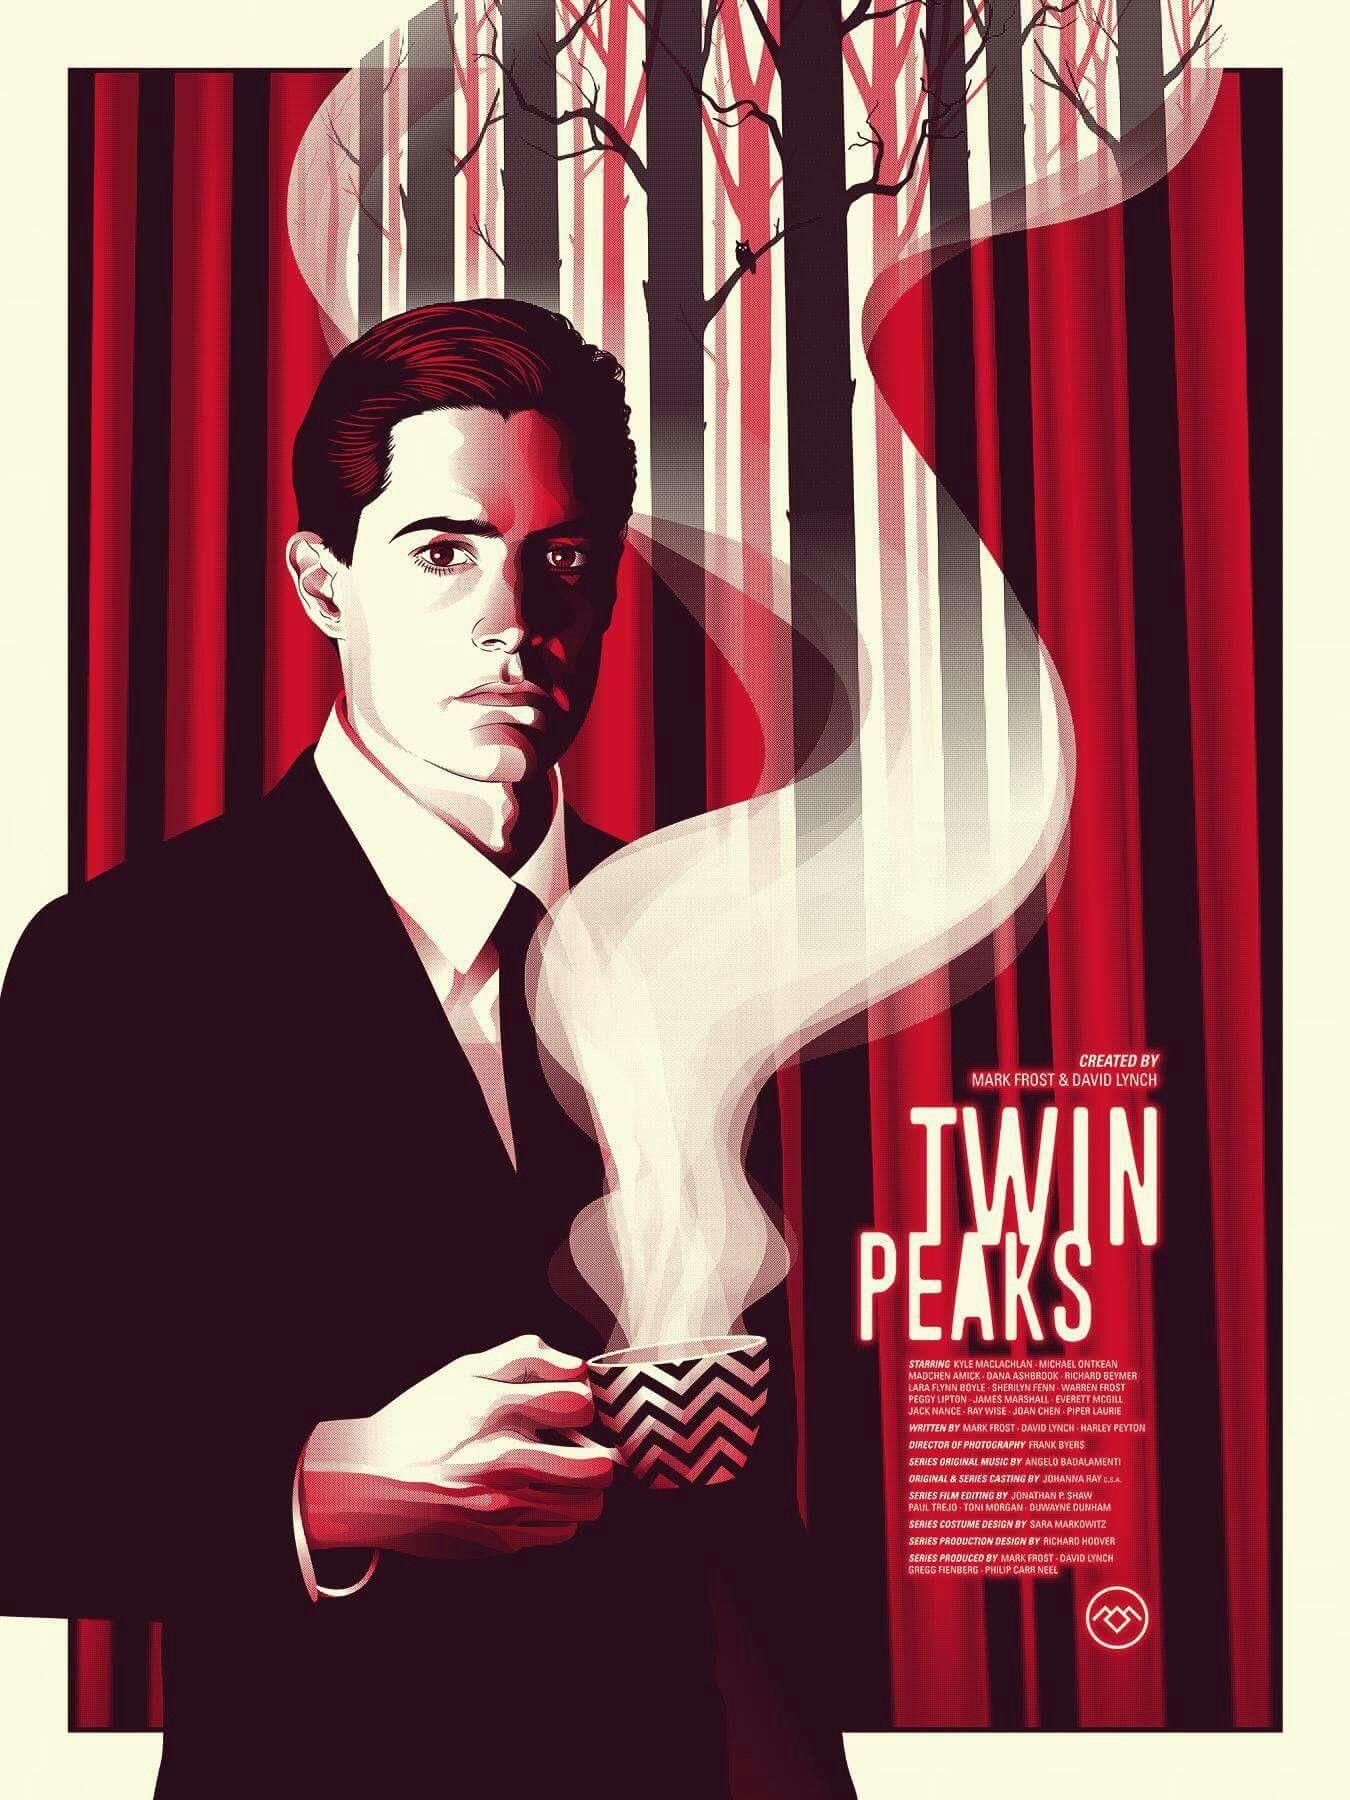 Twin Peaks David Lynch 2 prints Lot 11 x 17 High Quality Posters